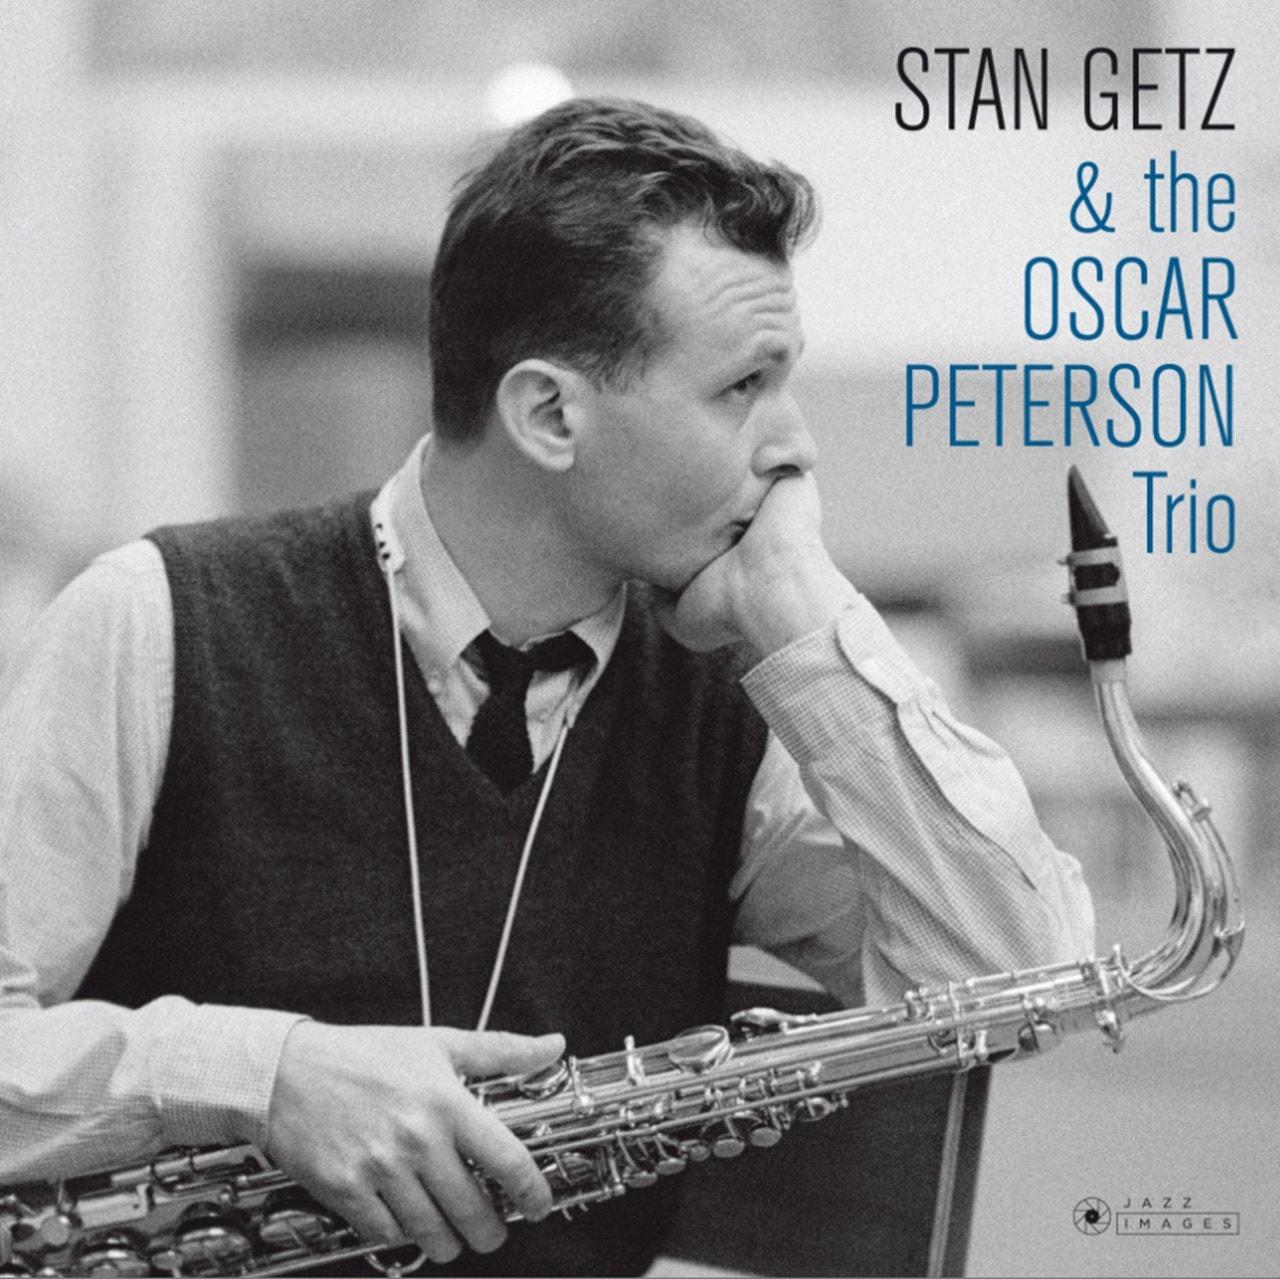 Stan Getz & the Oscar Peterson Trio - 1